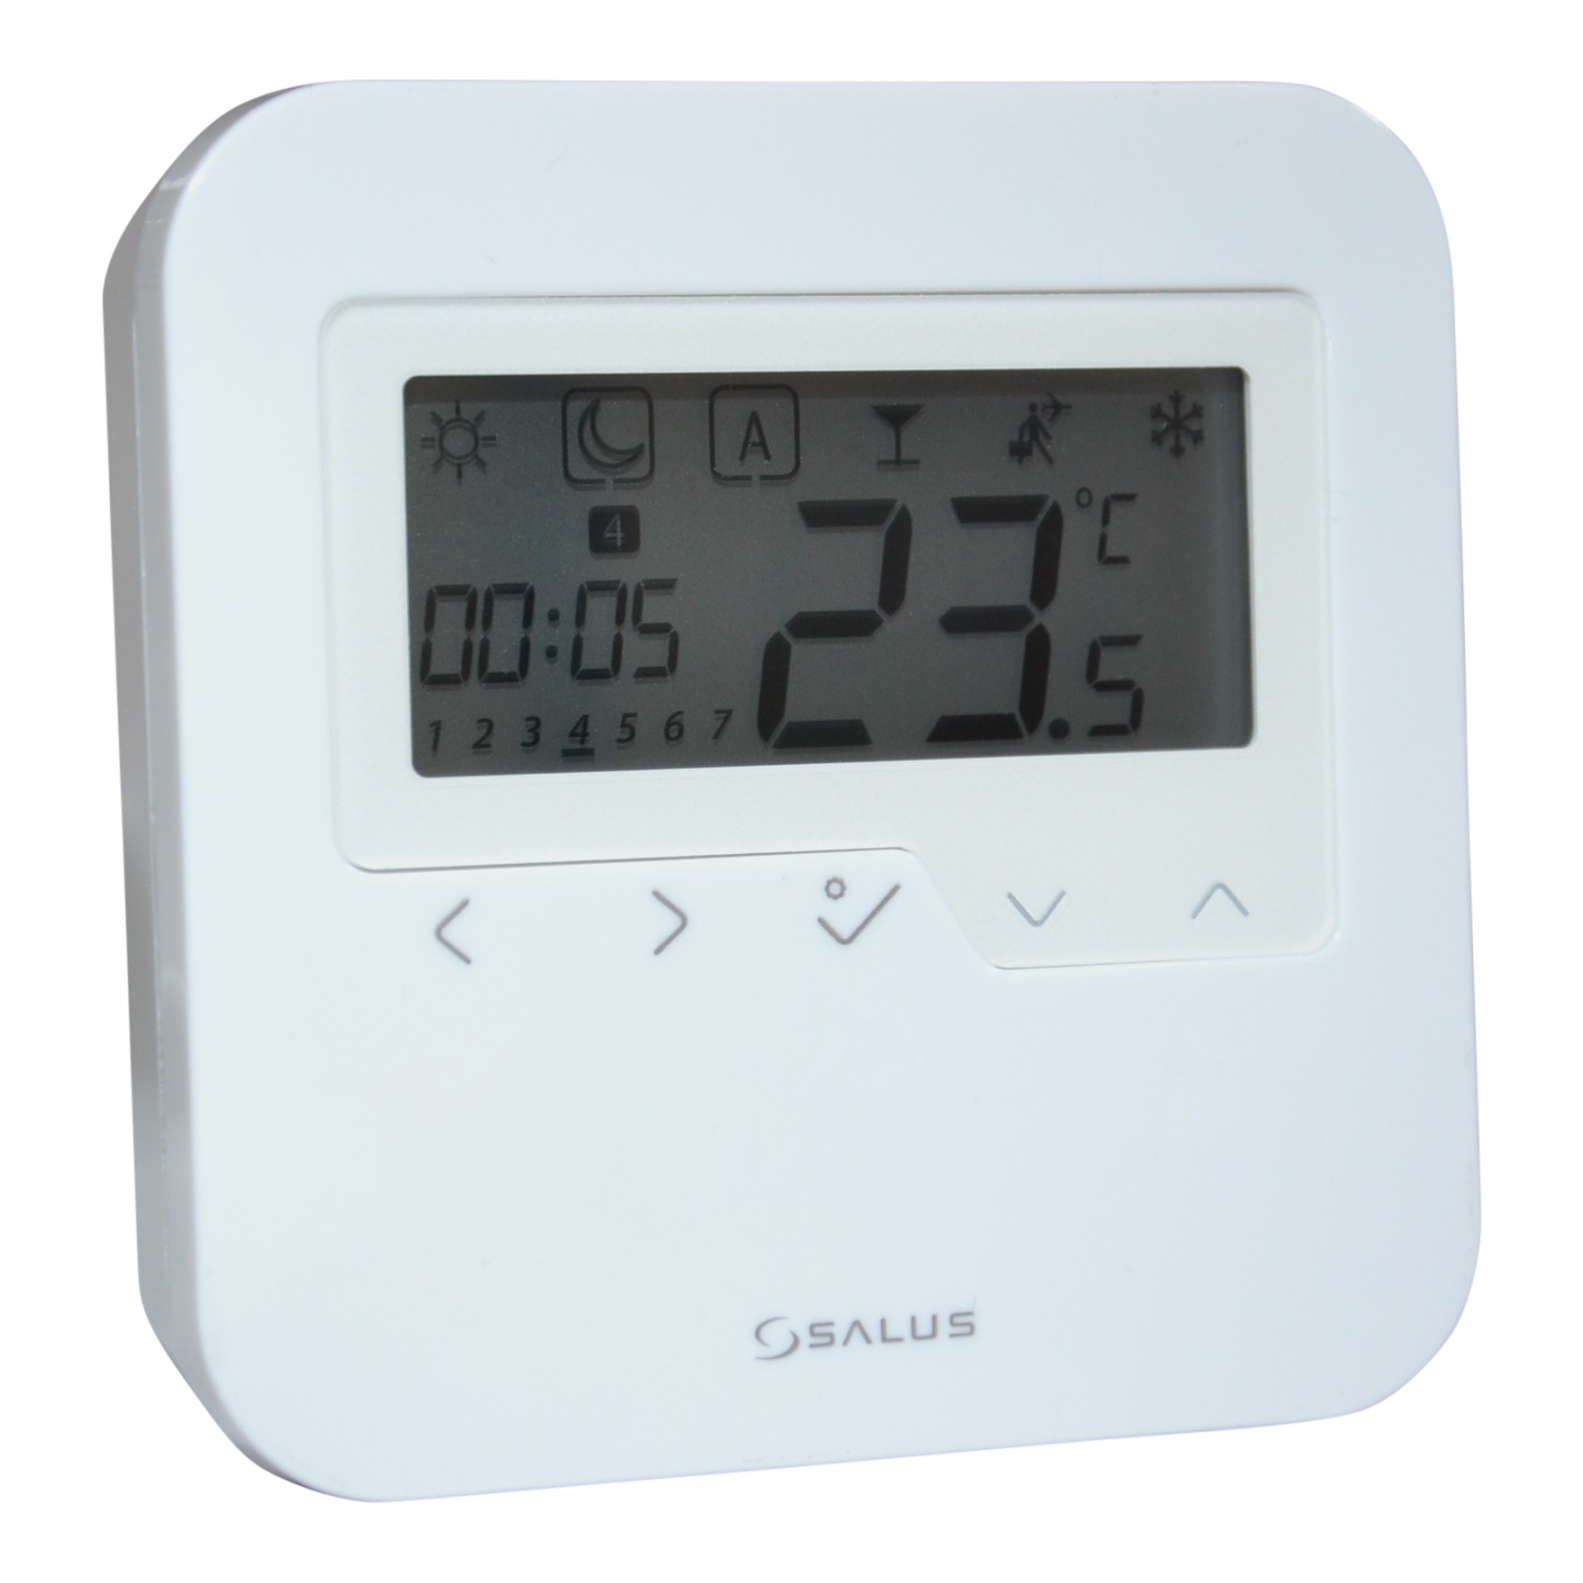 Salus HTRP230 digital Raumthermostat Fußbodenheizung LCD Raumregler Thermostat